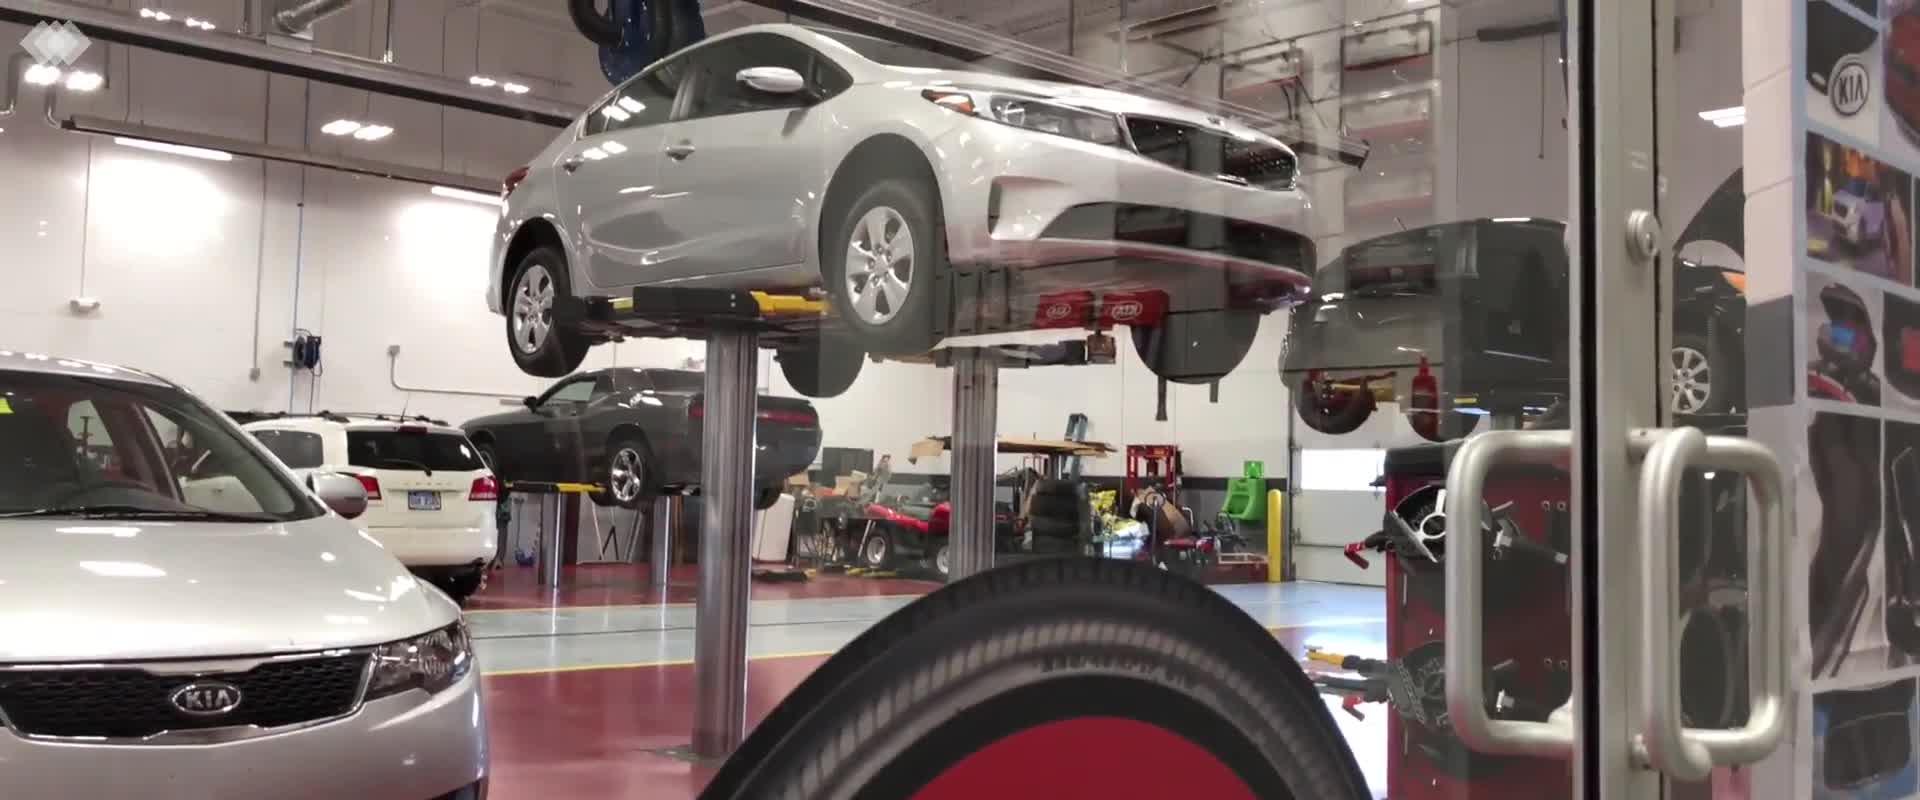 Summit Place Kia | New & Used Vehicle Sales Michigan